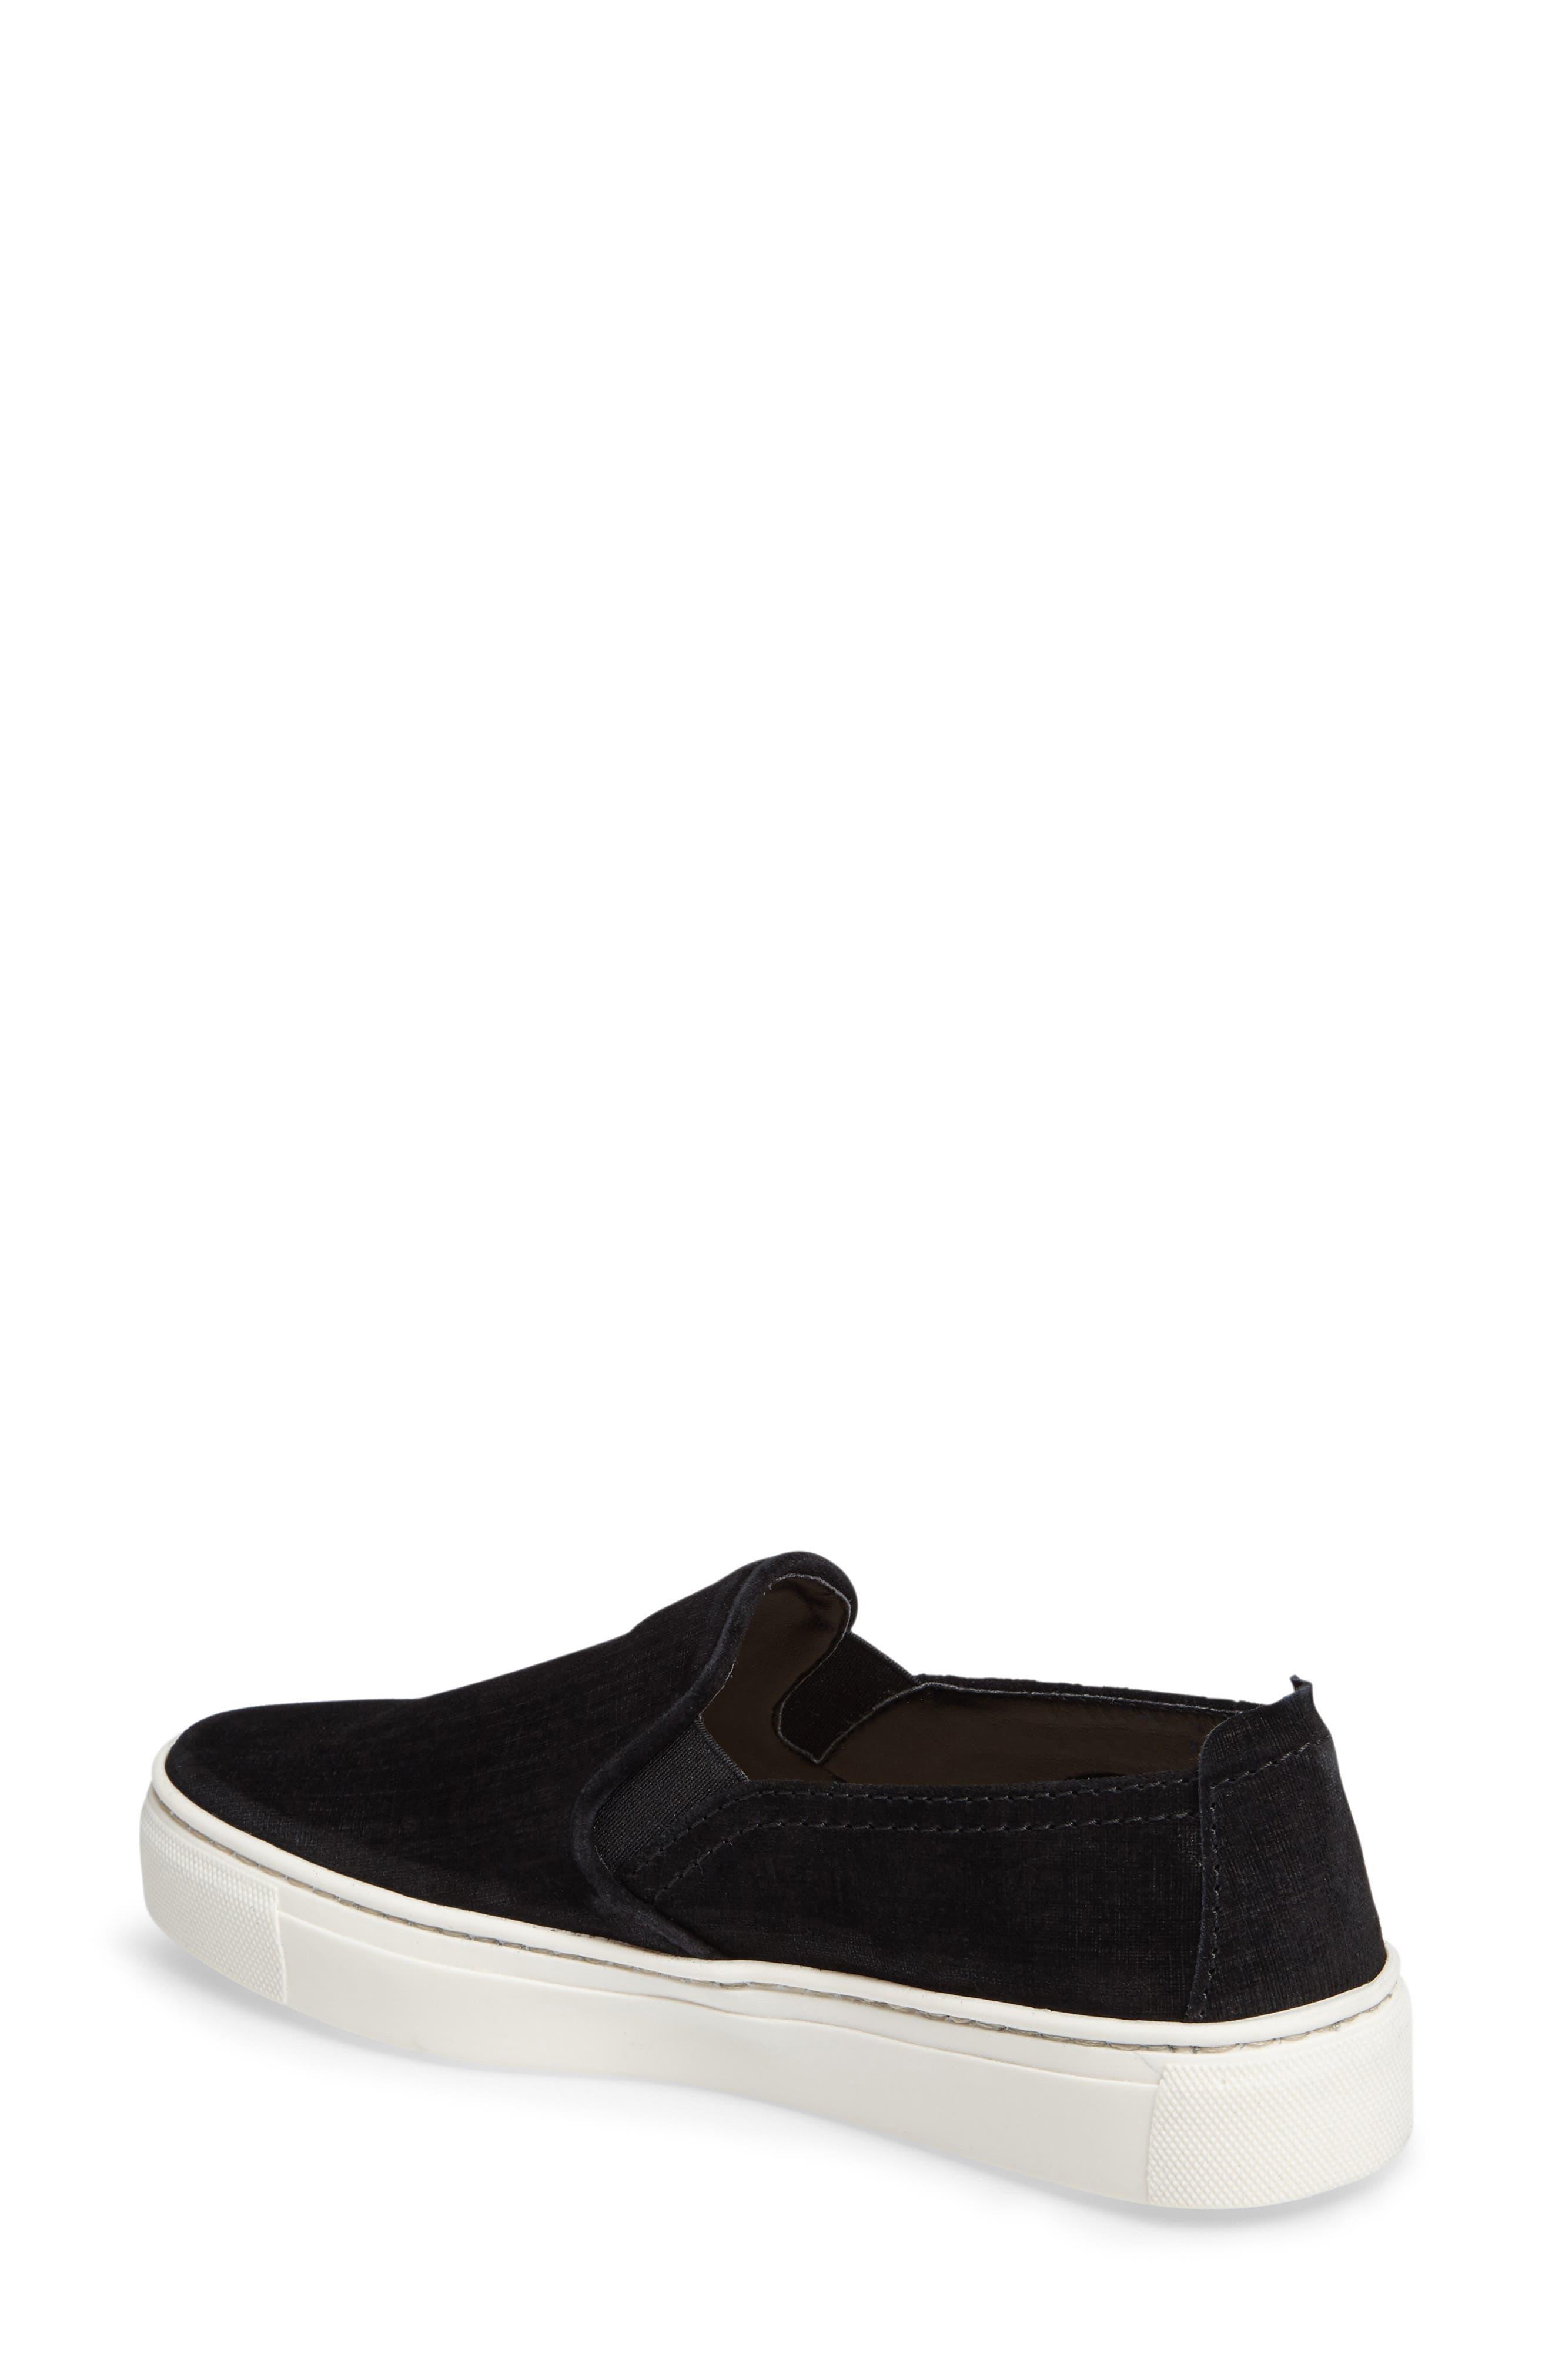 'Sneak Name' Sneaker,                             Alternate thumbnail 2, color,                             Black